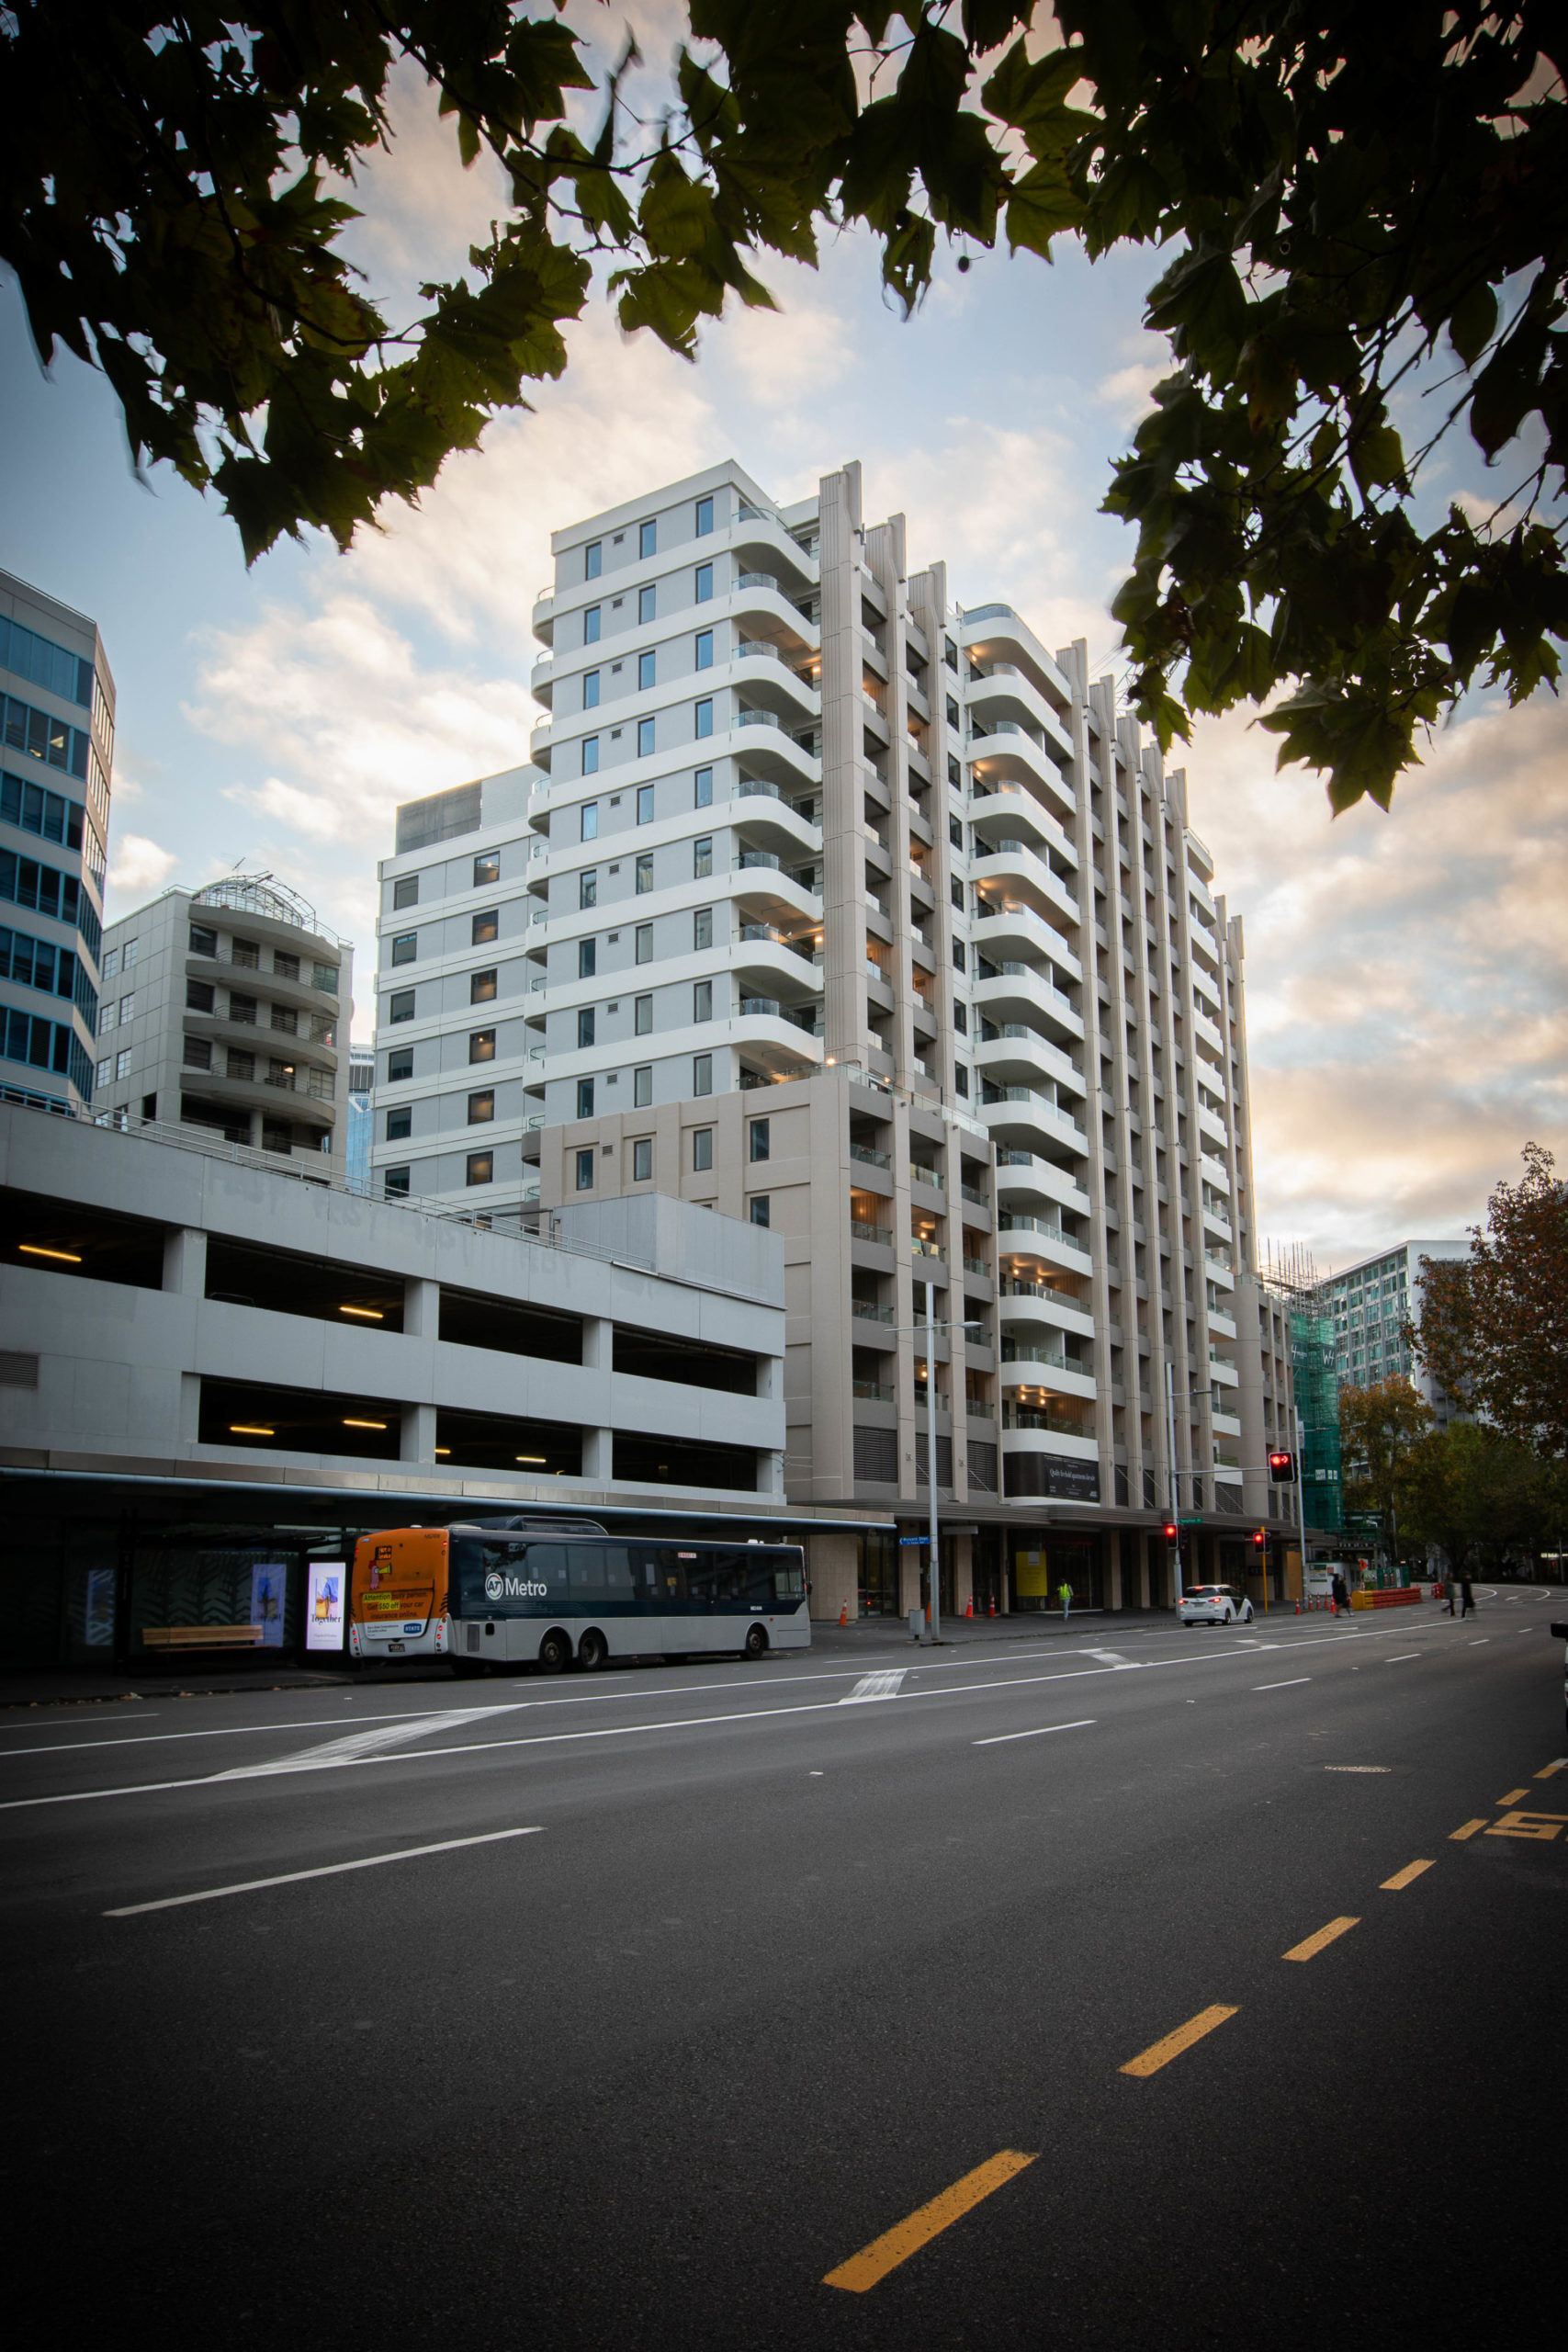 Antipodean Apartments Exterior scaled